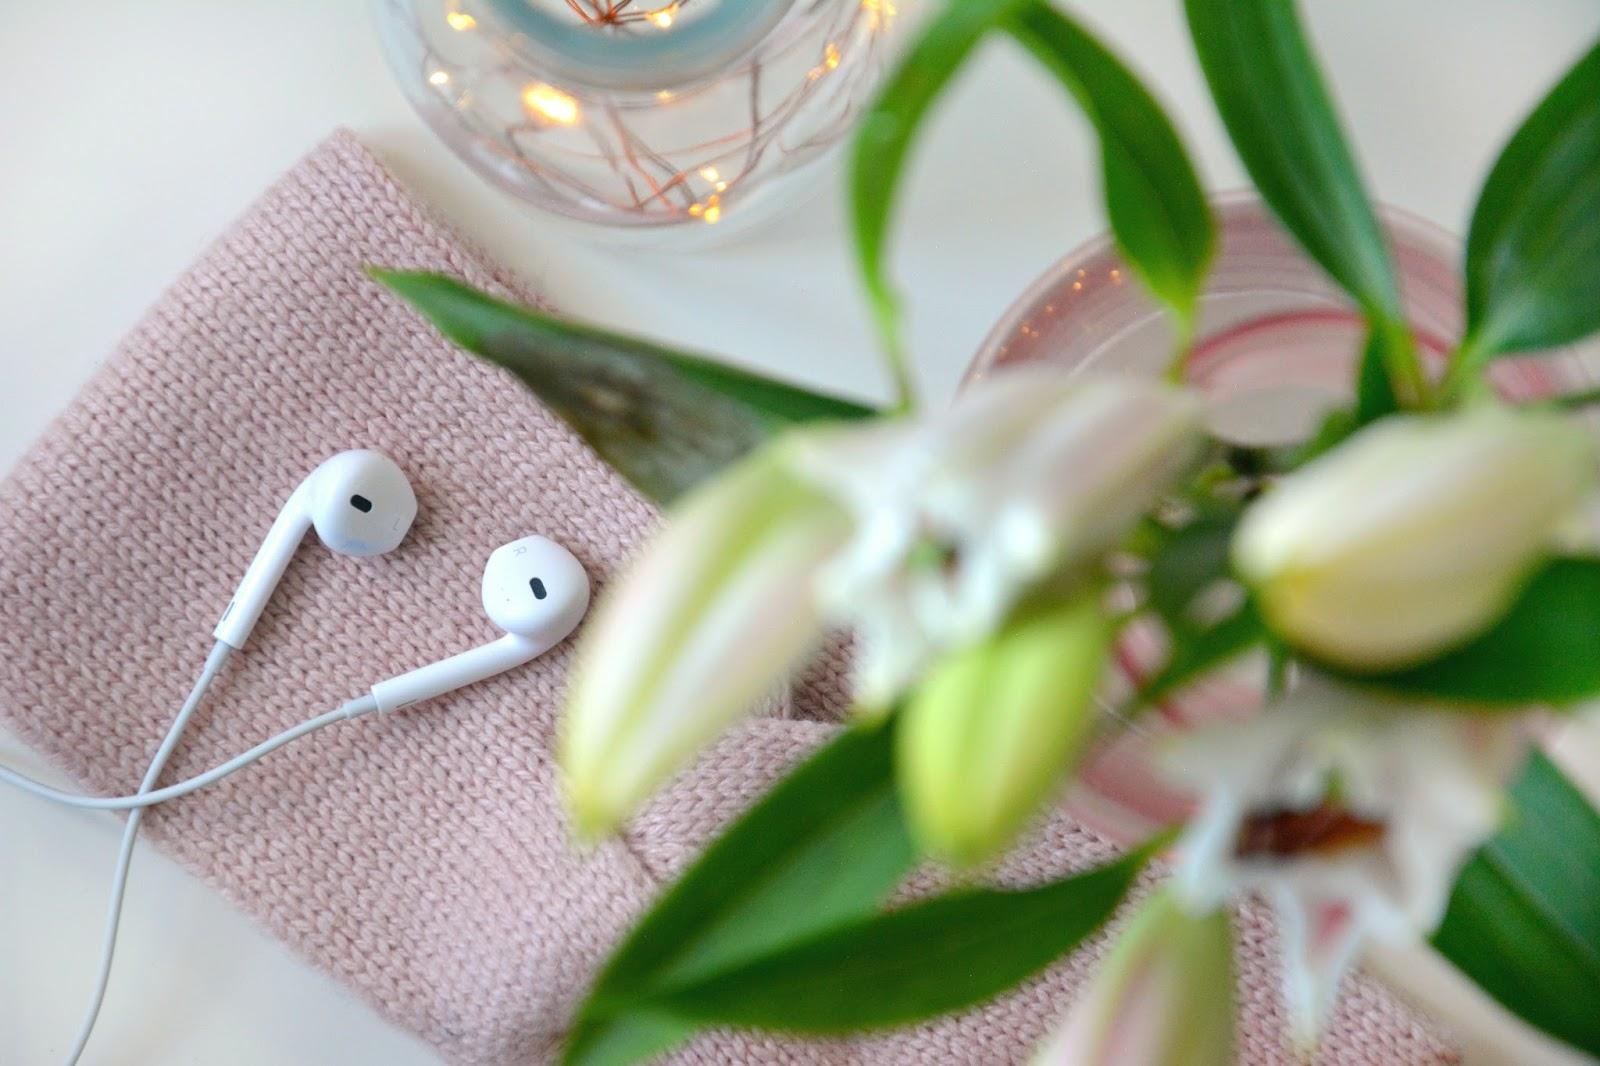 Apple Headphones; H&M Accessories; Fresh Lilies